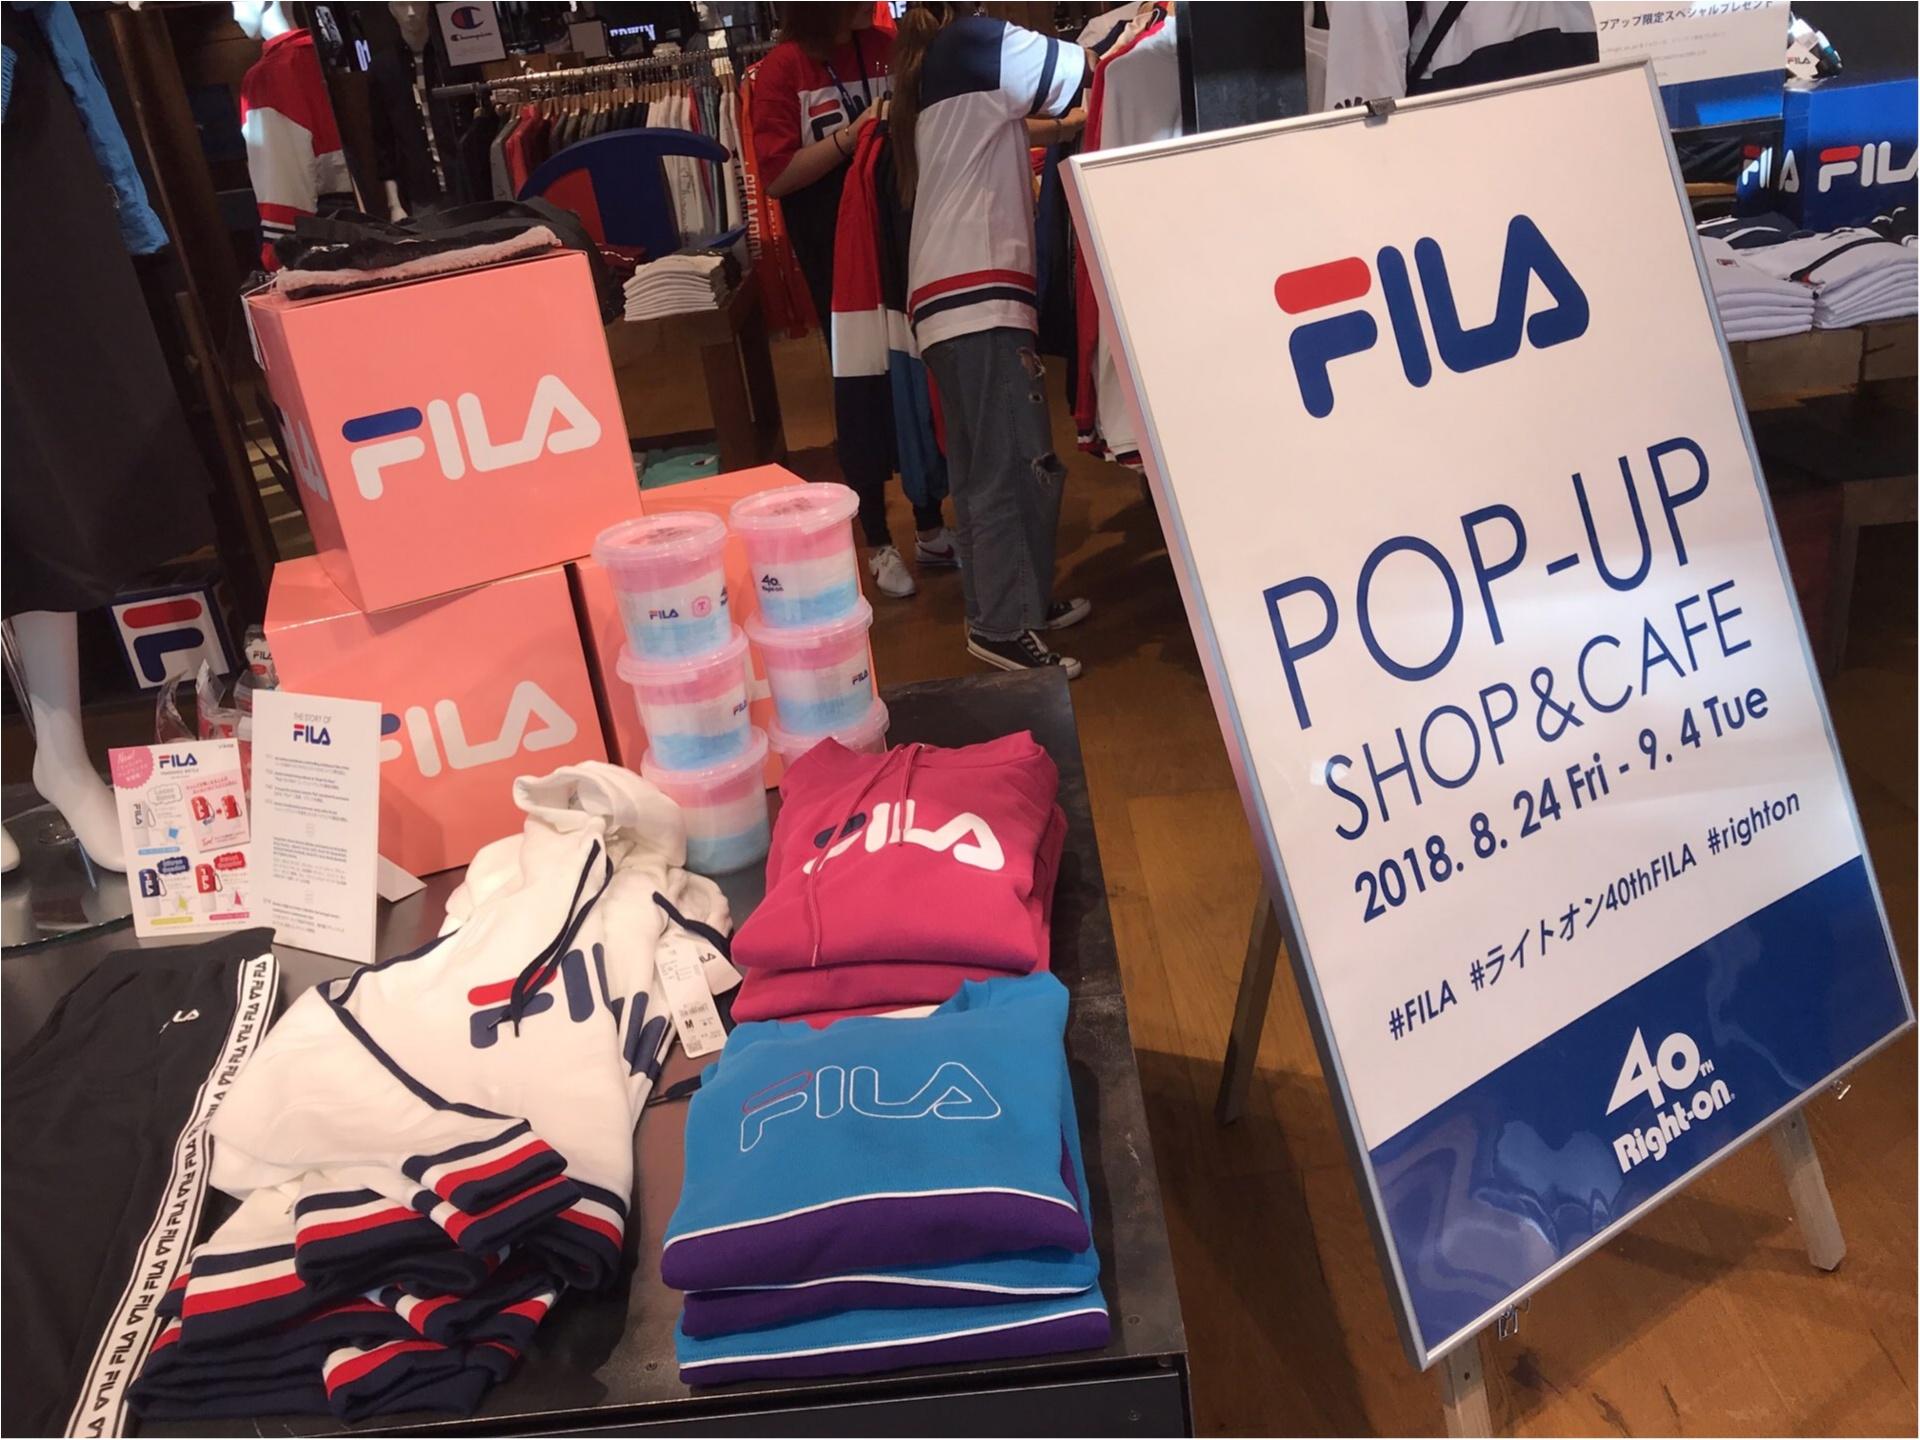 【FILA(フィラ)】がRight-onをジャック!?POP-UPSHOP&CAFEがオープン★_1